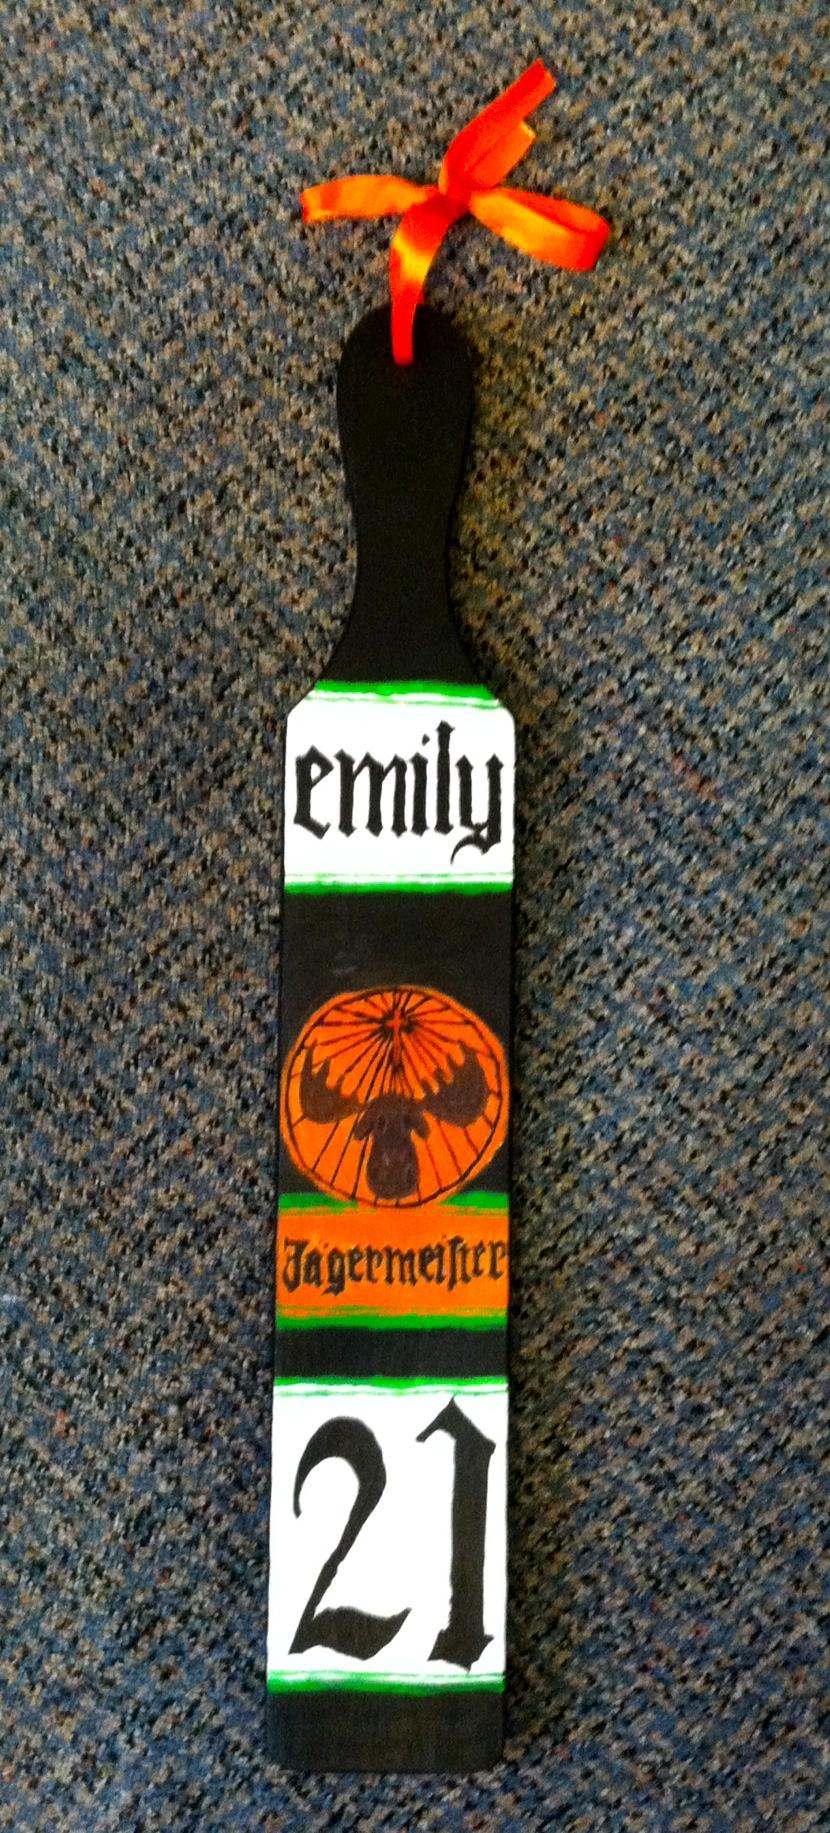 Emilys Paddle.jpg